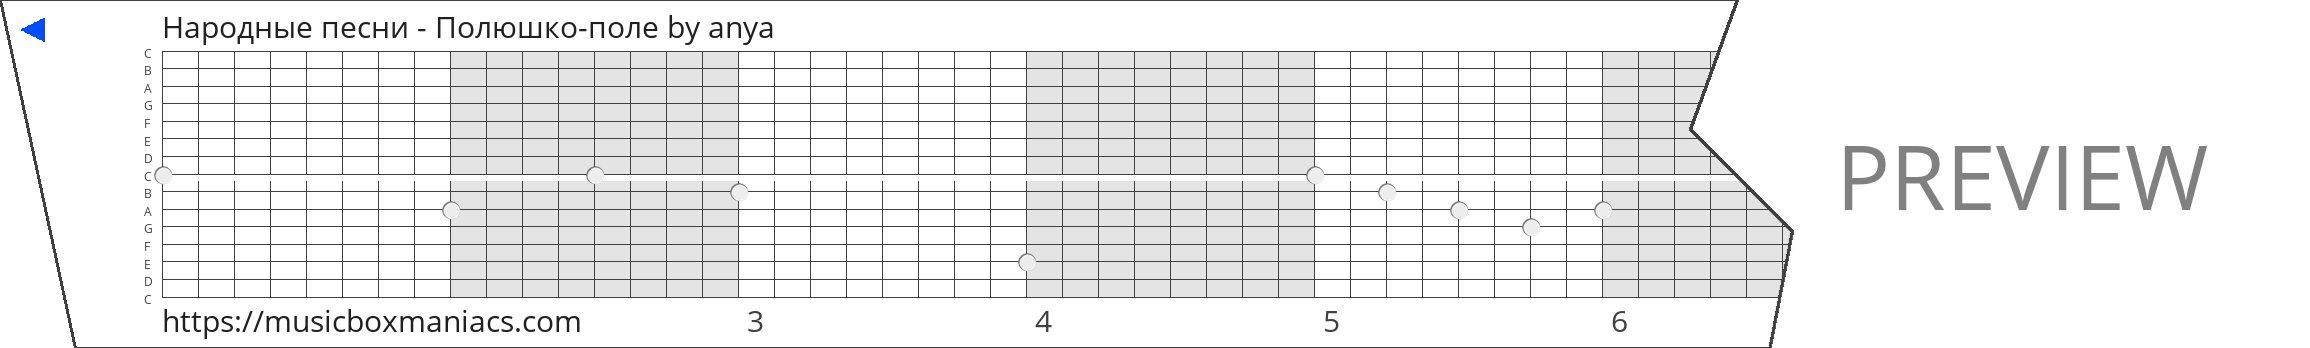 Народные песни - Полюшко-поле 15 note music box paper strip